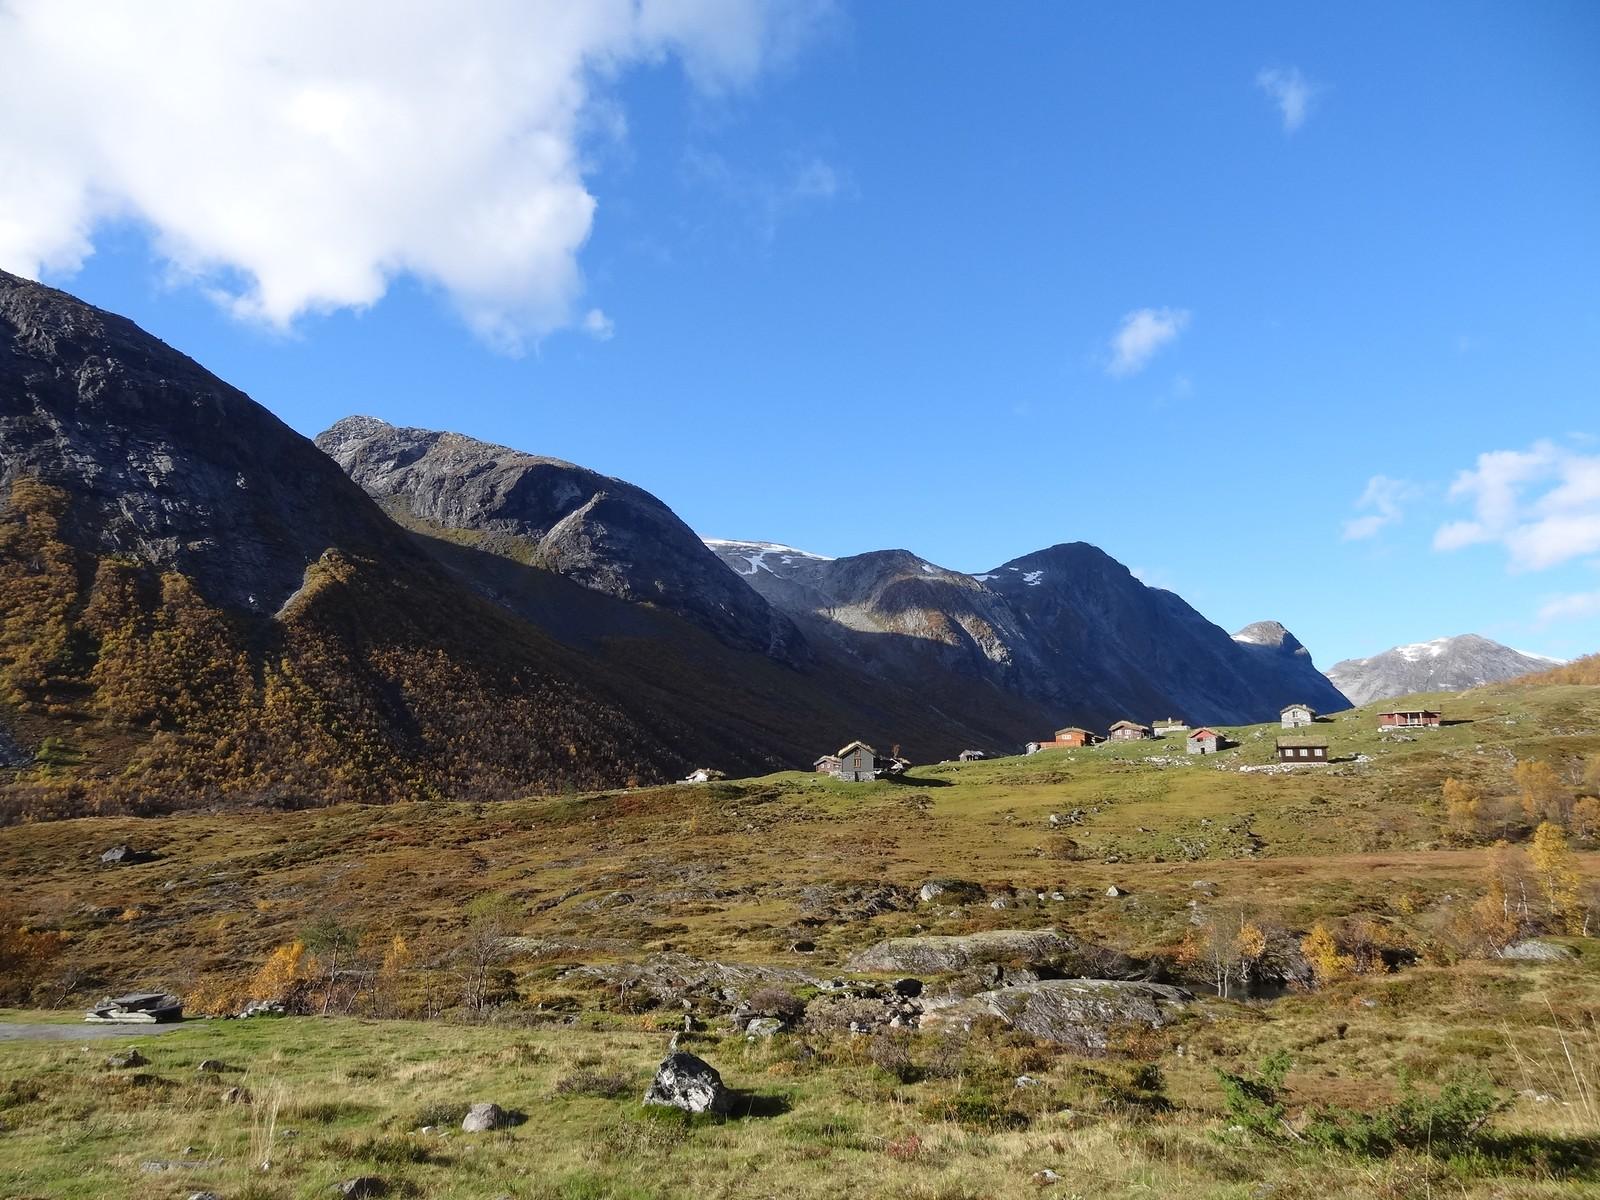 Skjæringsdalen, Strynefjellet